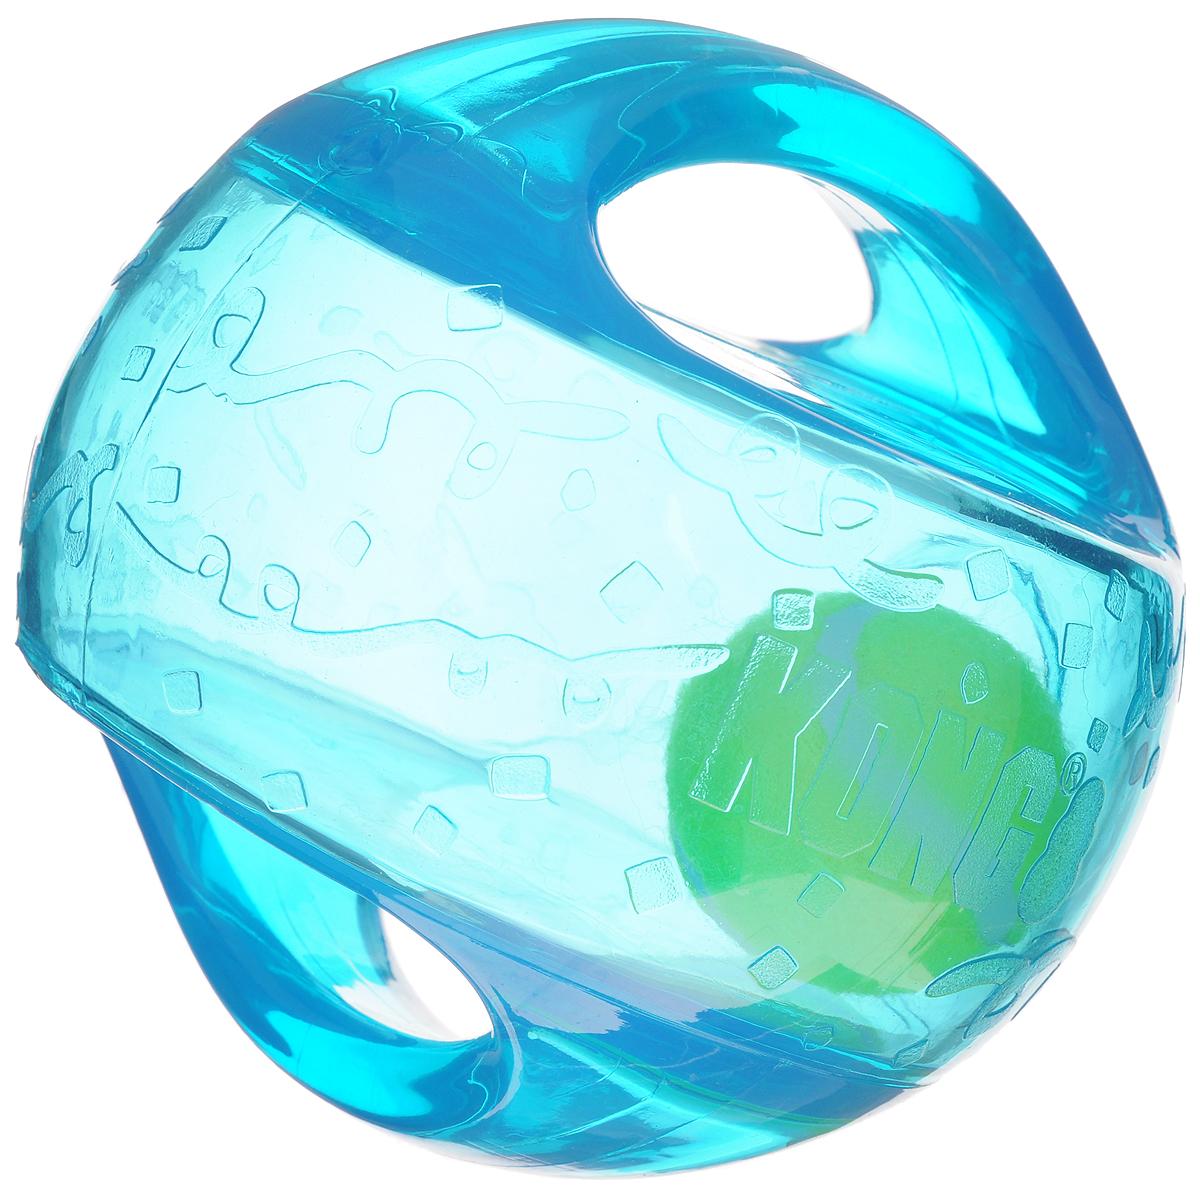 Игрушка для собак Kong Мячик L/XL, с пищалкой, цвет: прозрачный, бирюзовый, 18 х 18 х 18 см игрушка для собак kong регби с пищалкой цвет прозрачный фиолетовый 18 х 9 х 9 см